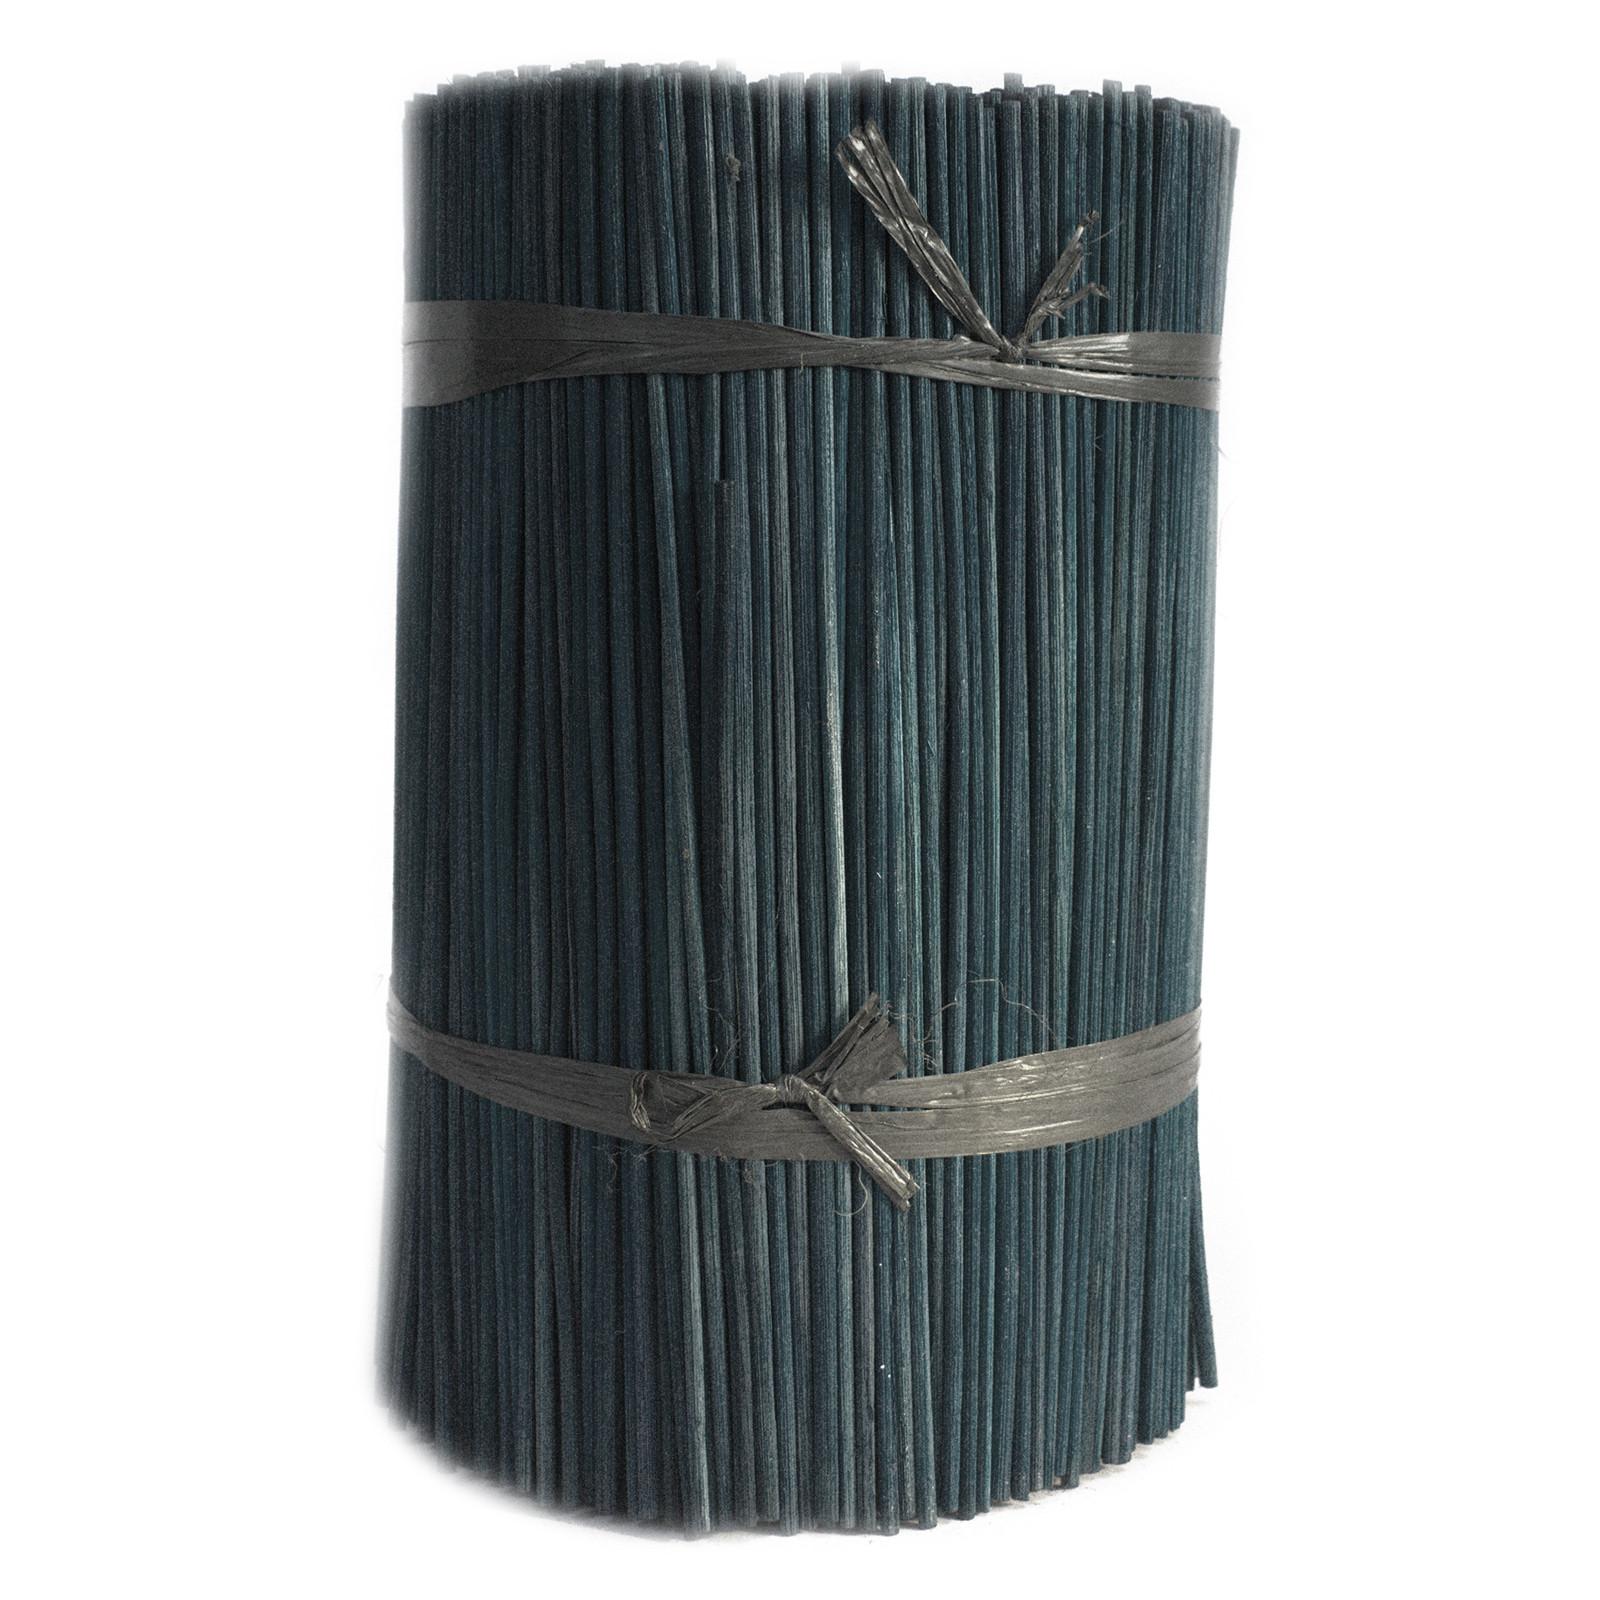 Green Reed Diffuser Sticks 25cm x 3mm 500gms